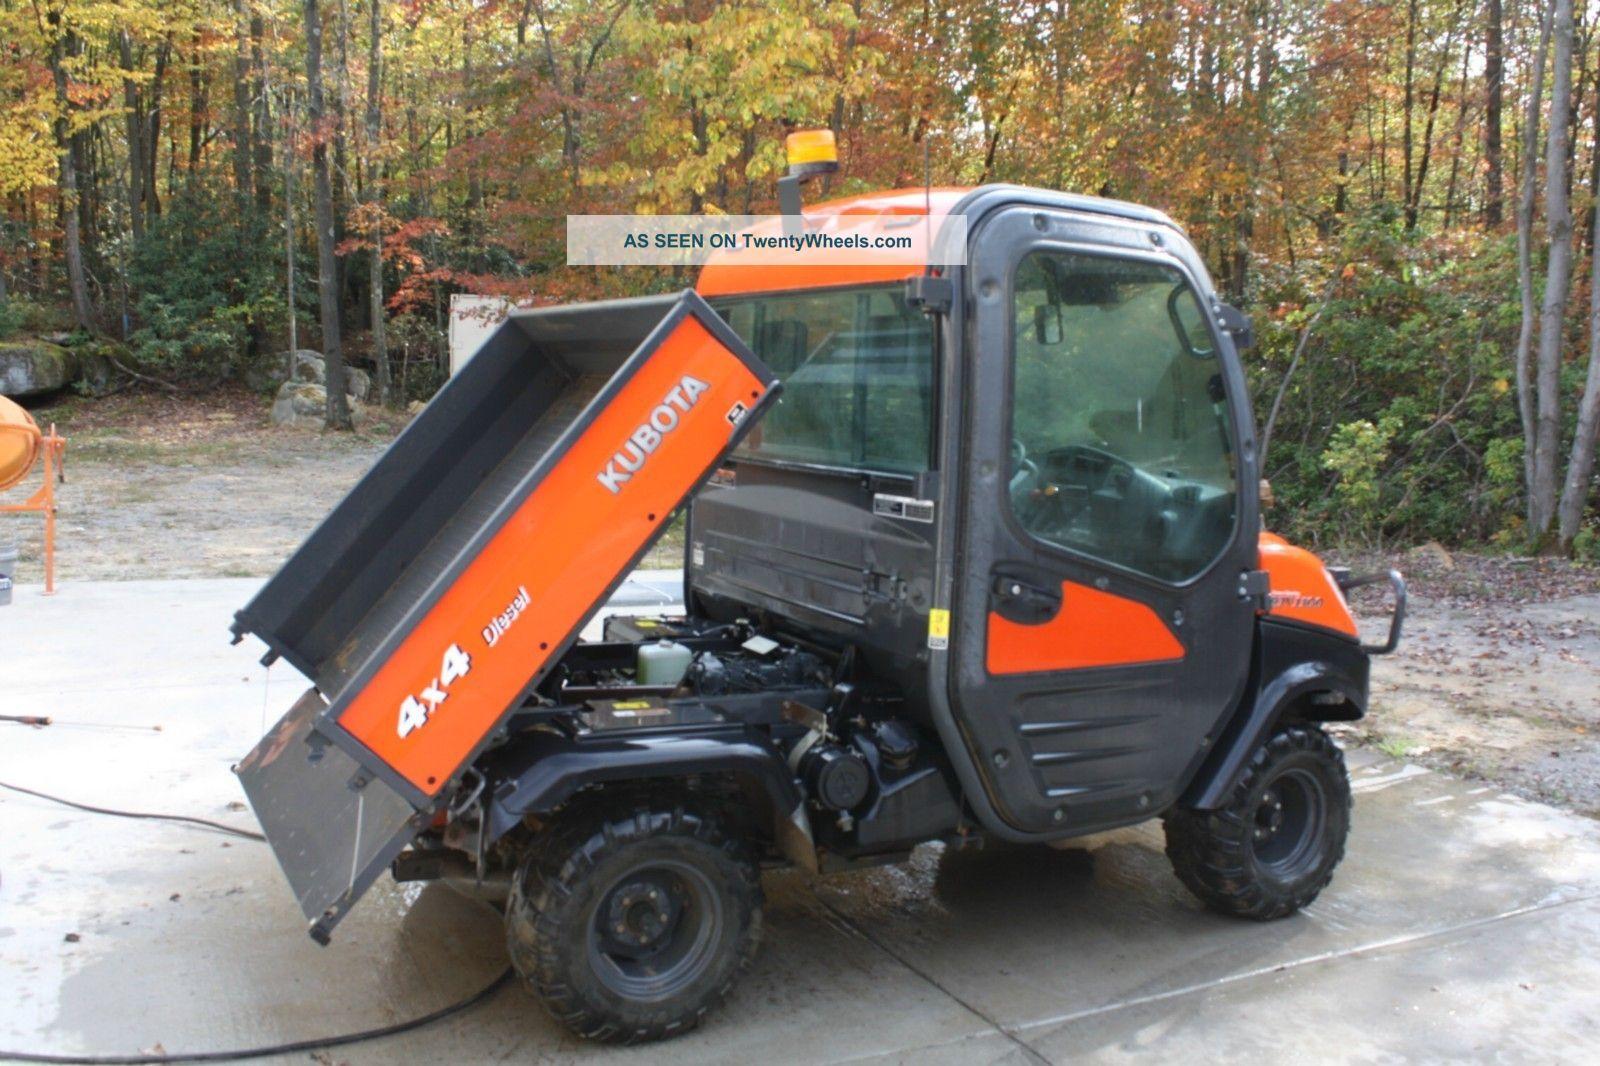 Kubota Rtv 1100 Modifications : Kubota rtv utility vehicles for sale